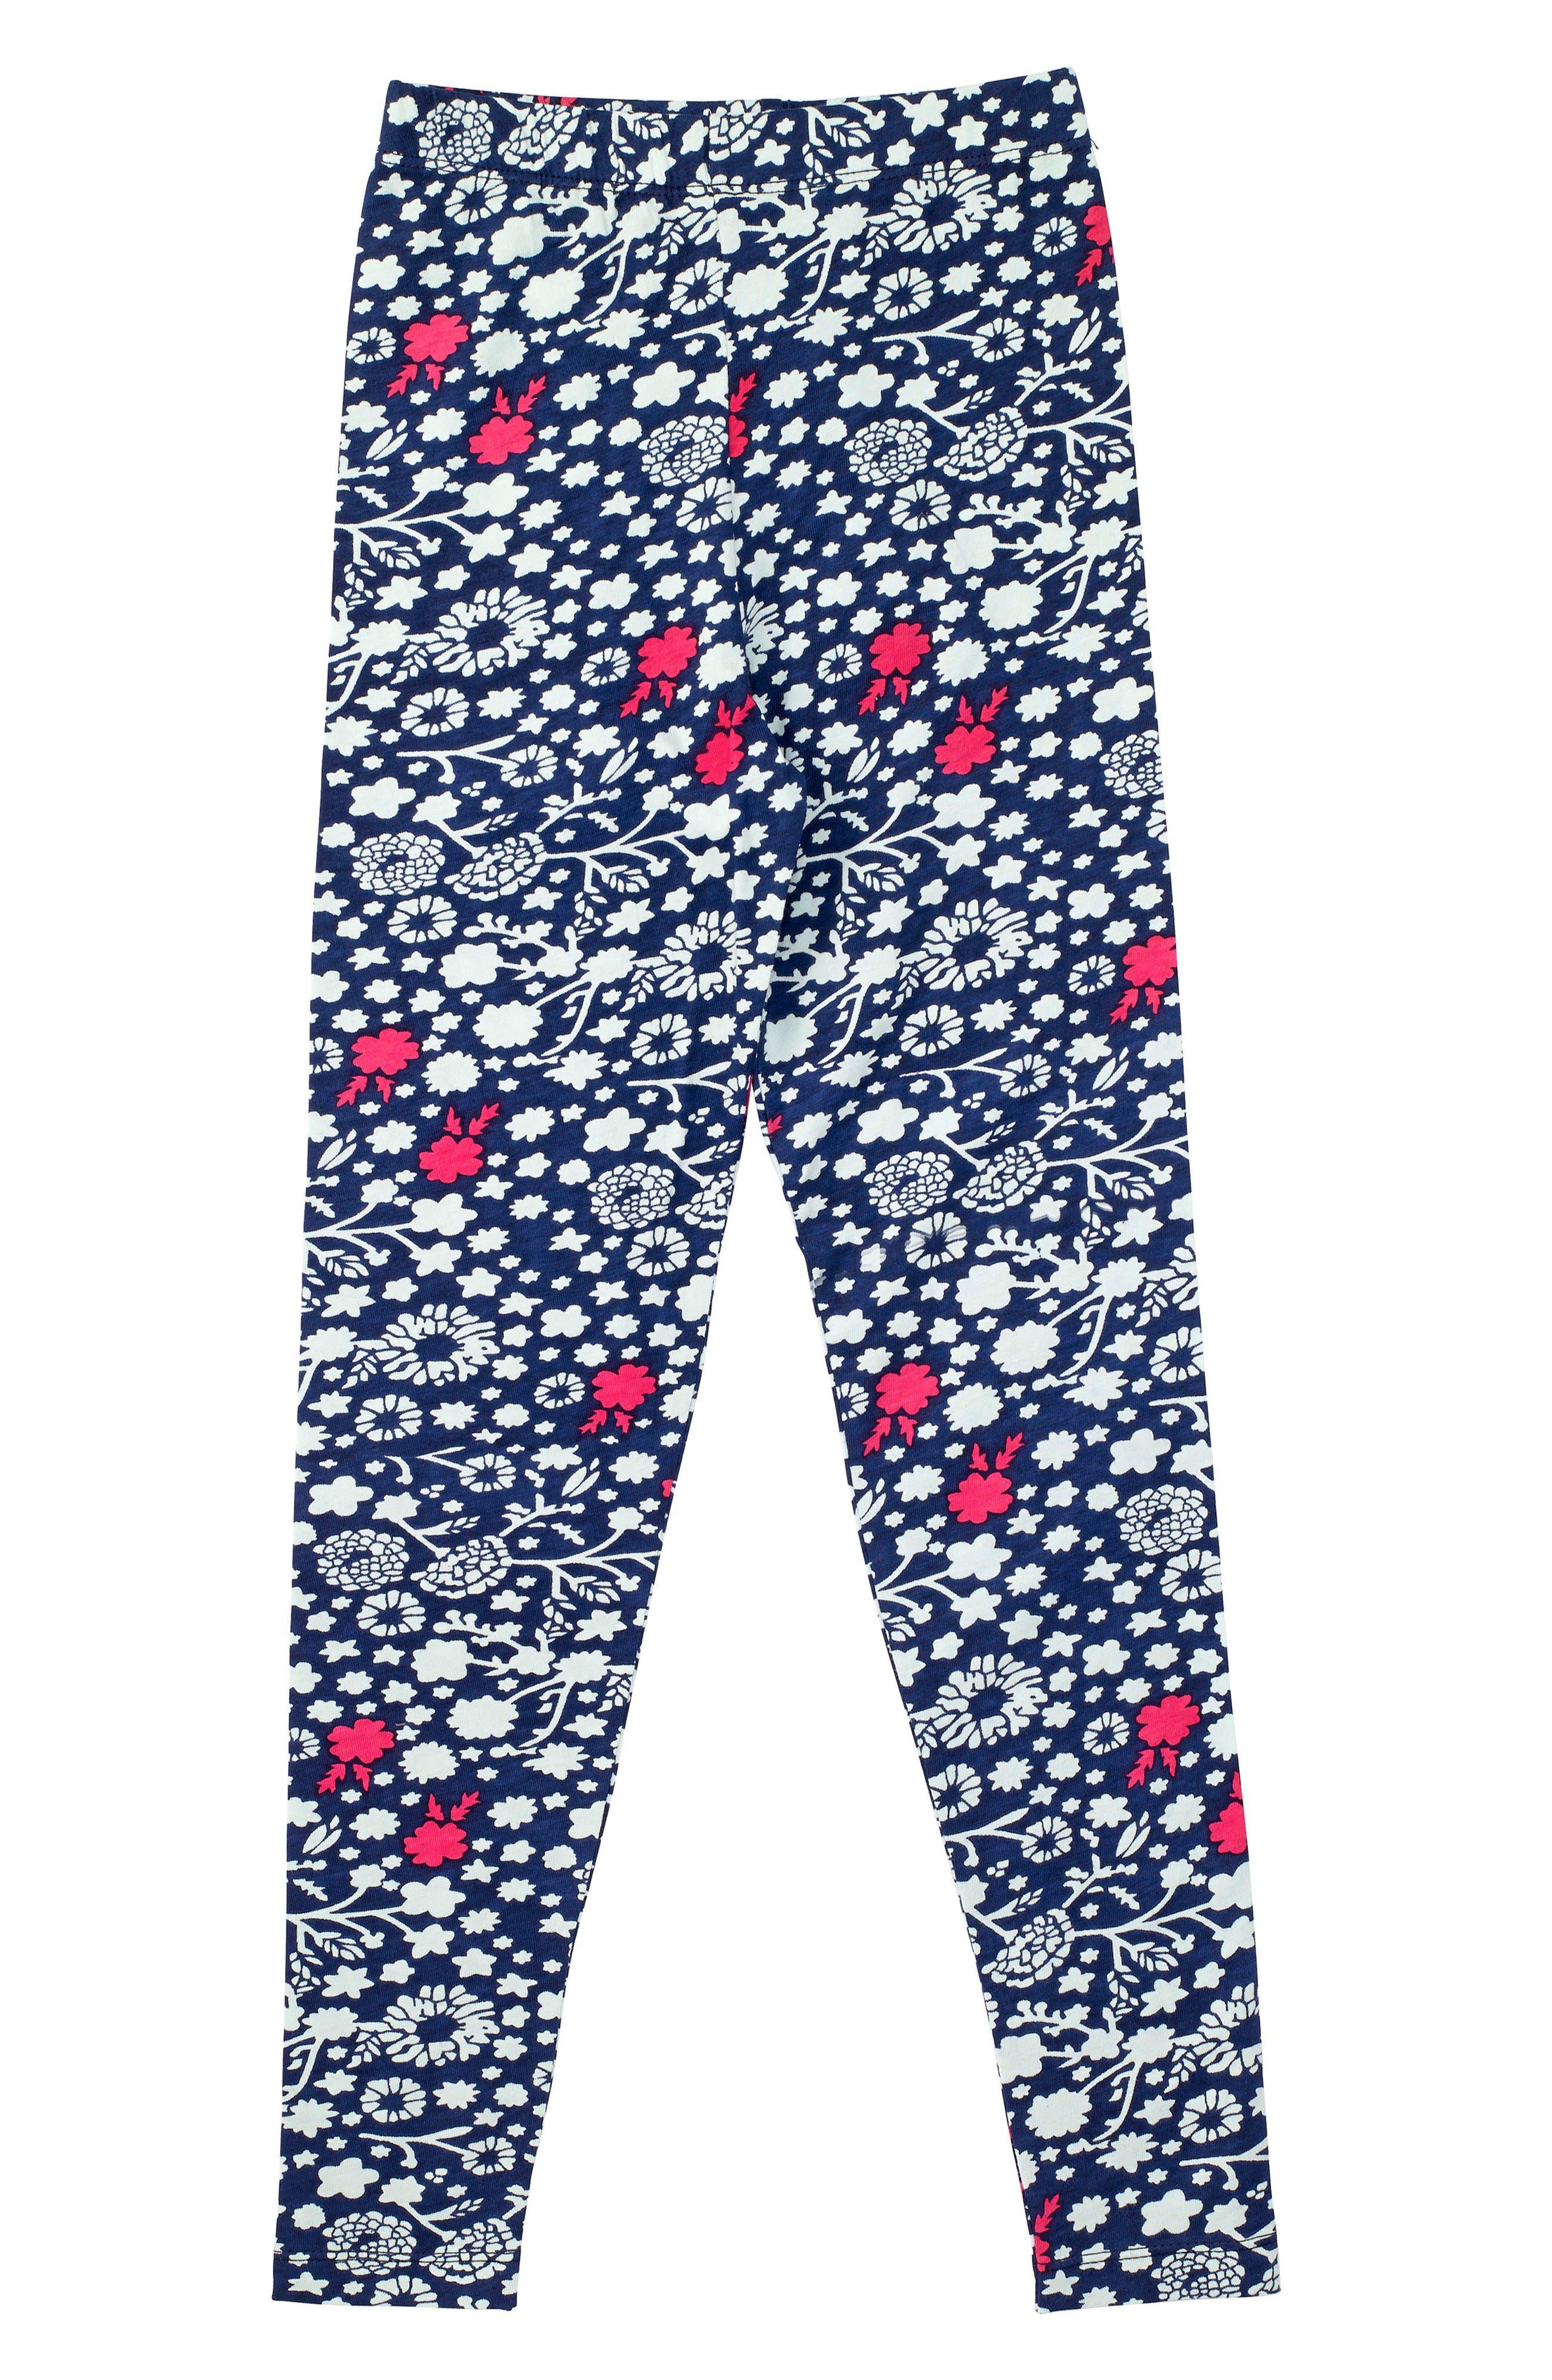 Bloom Organic Cotton Leggings,                         Main,                         color, Navy